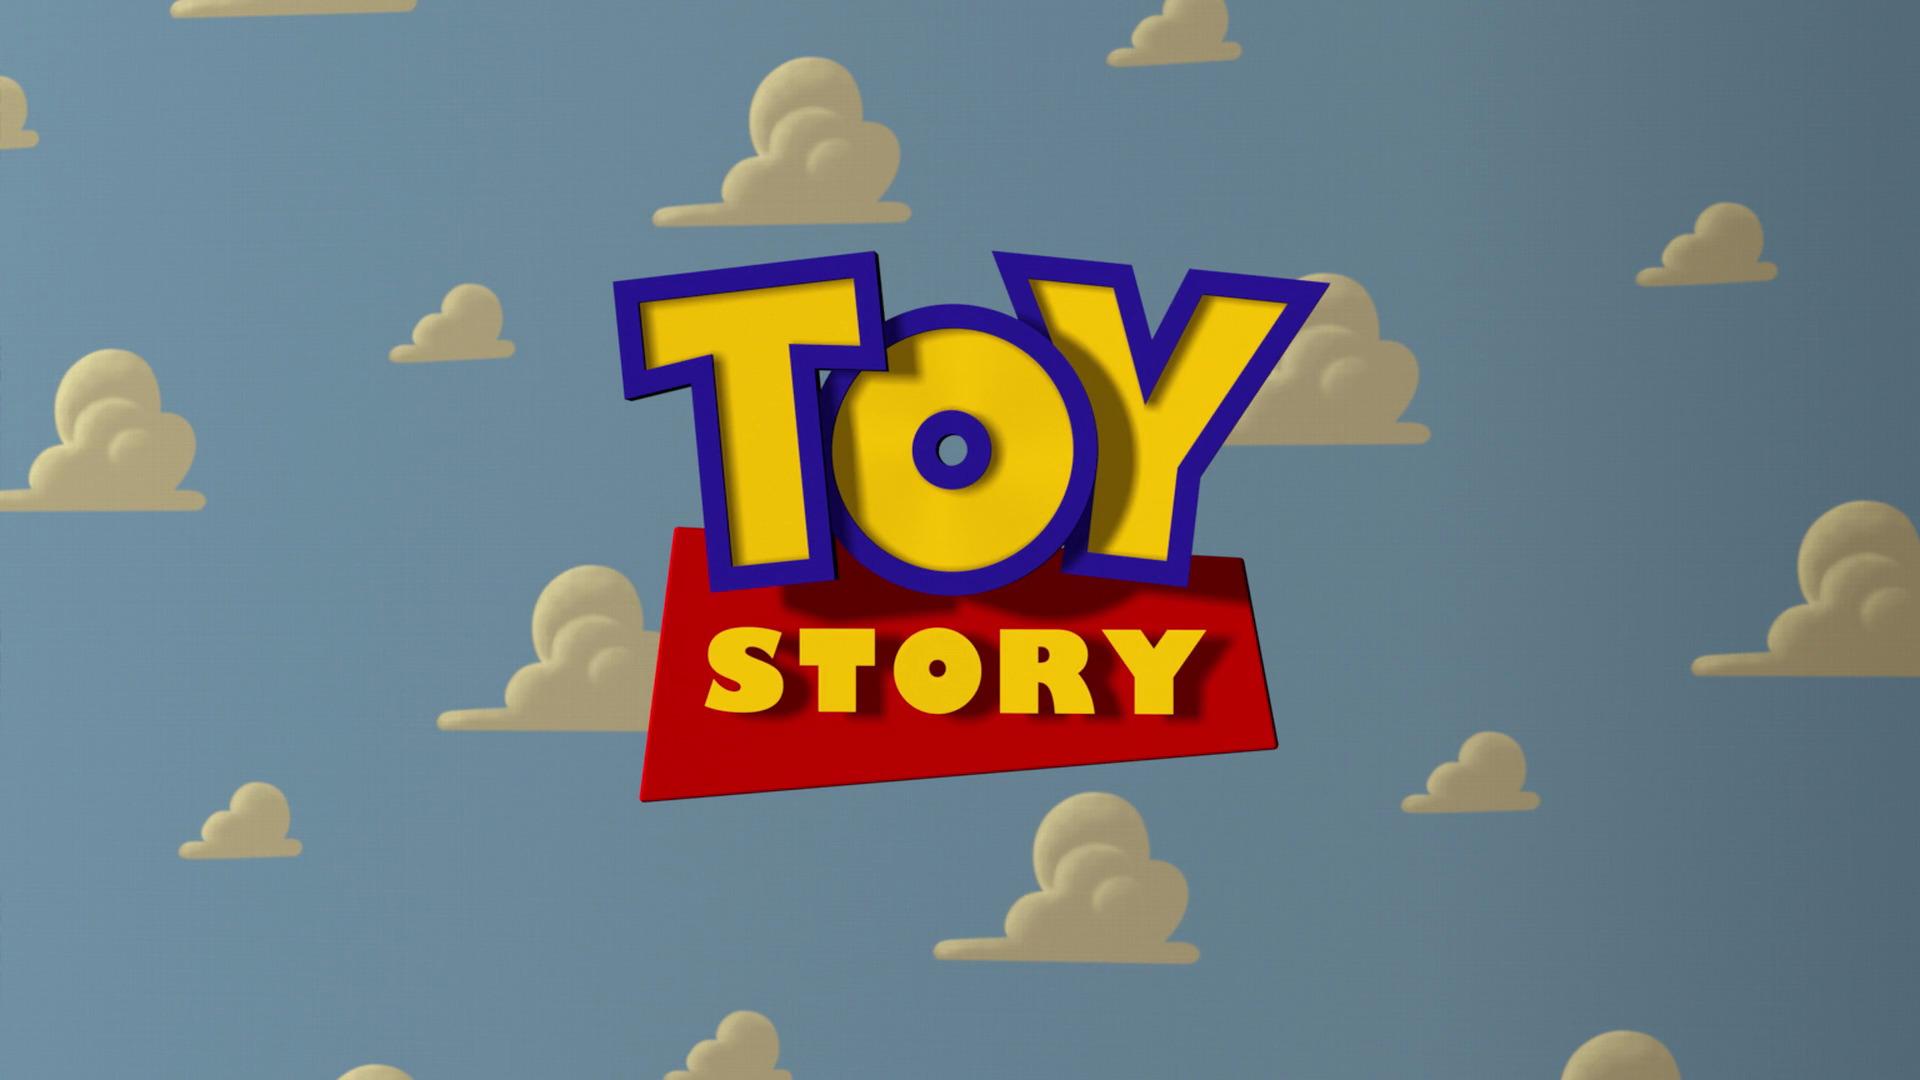 Toy story 2 activity center toy shelf showdown